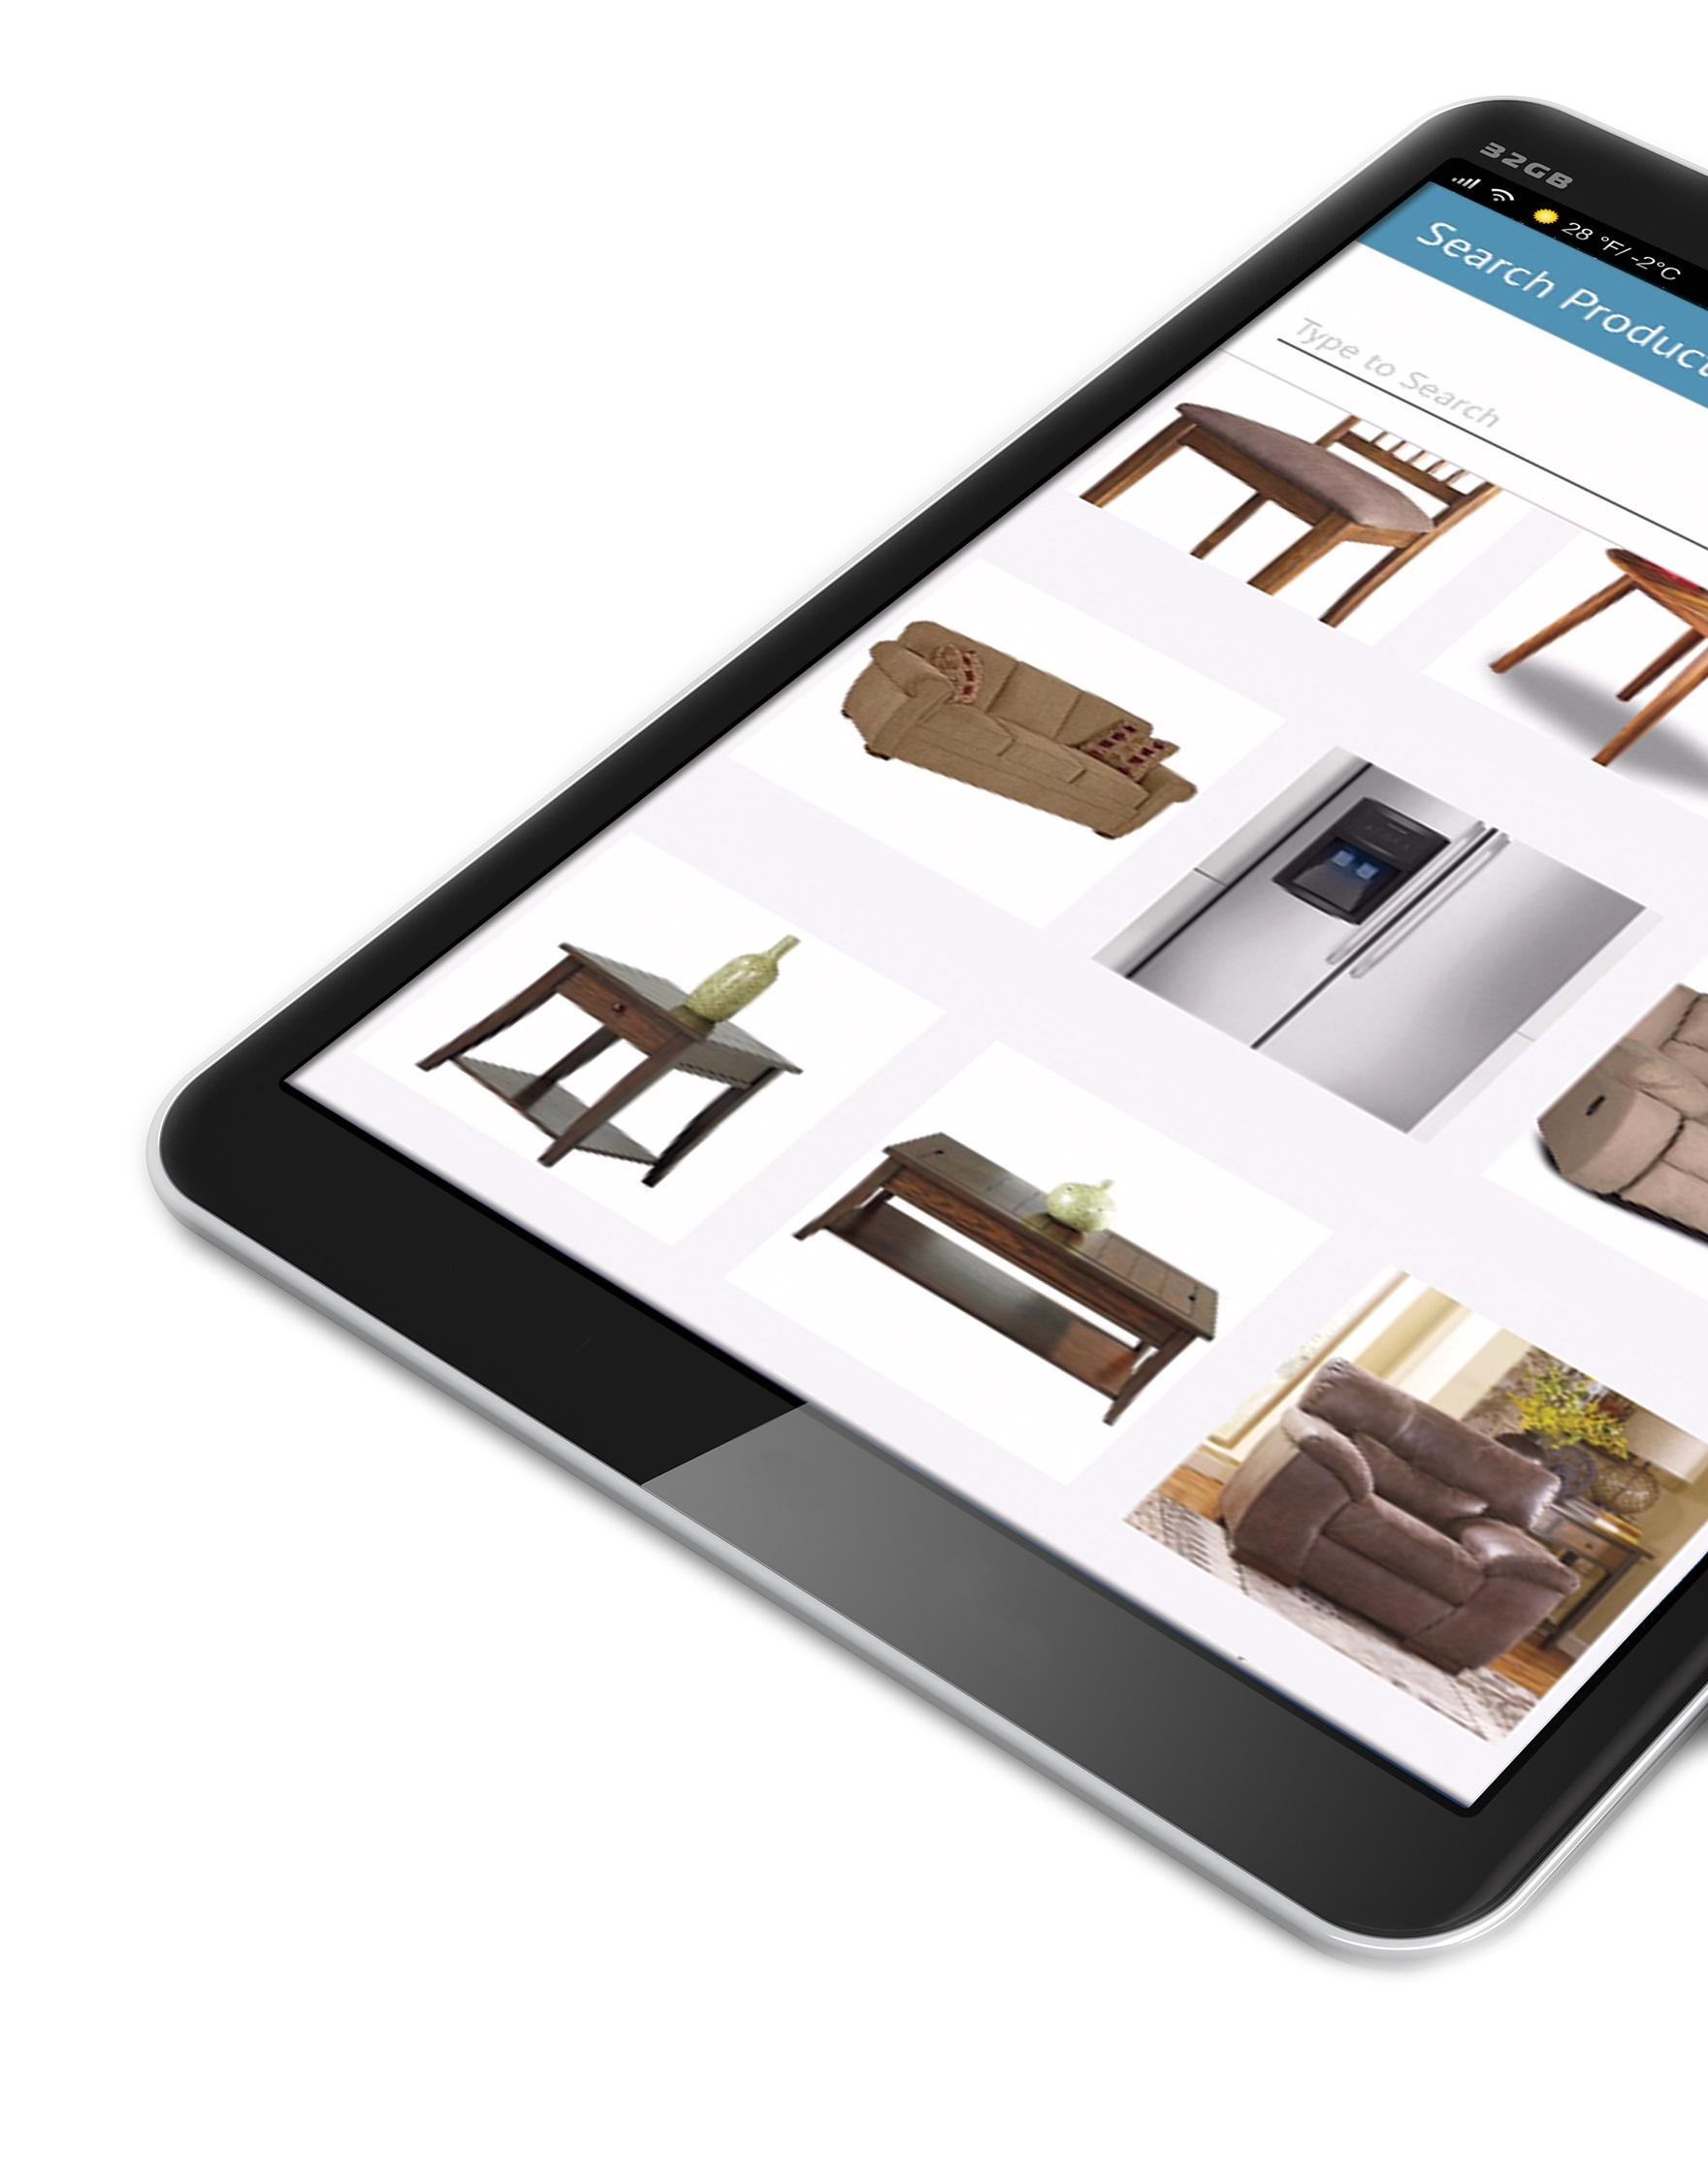 iPad-iPhone-high-res.jpg